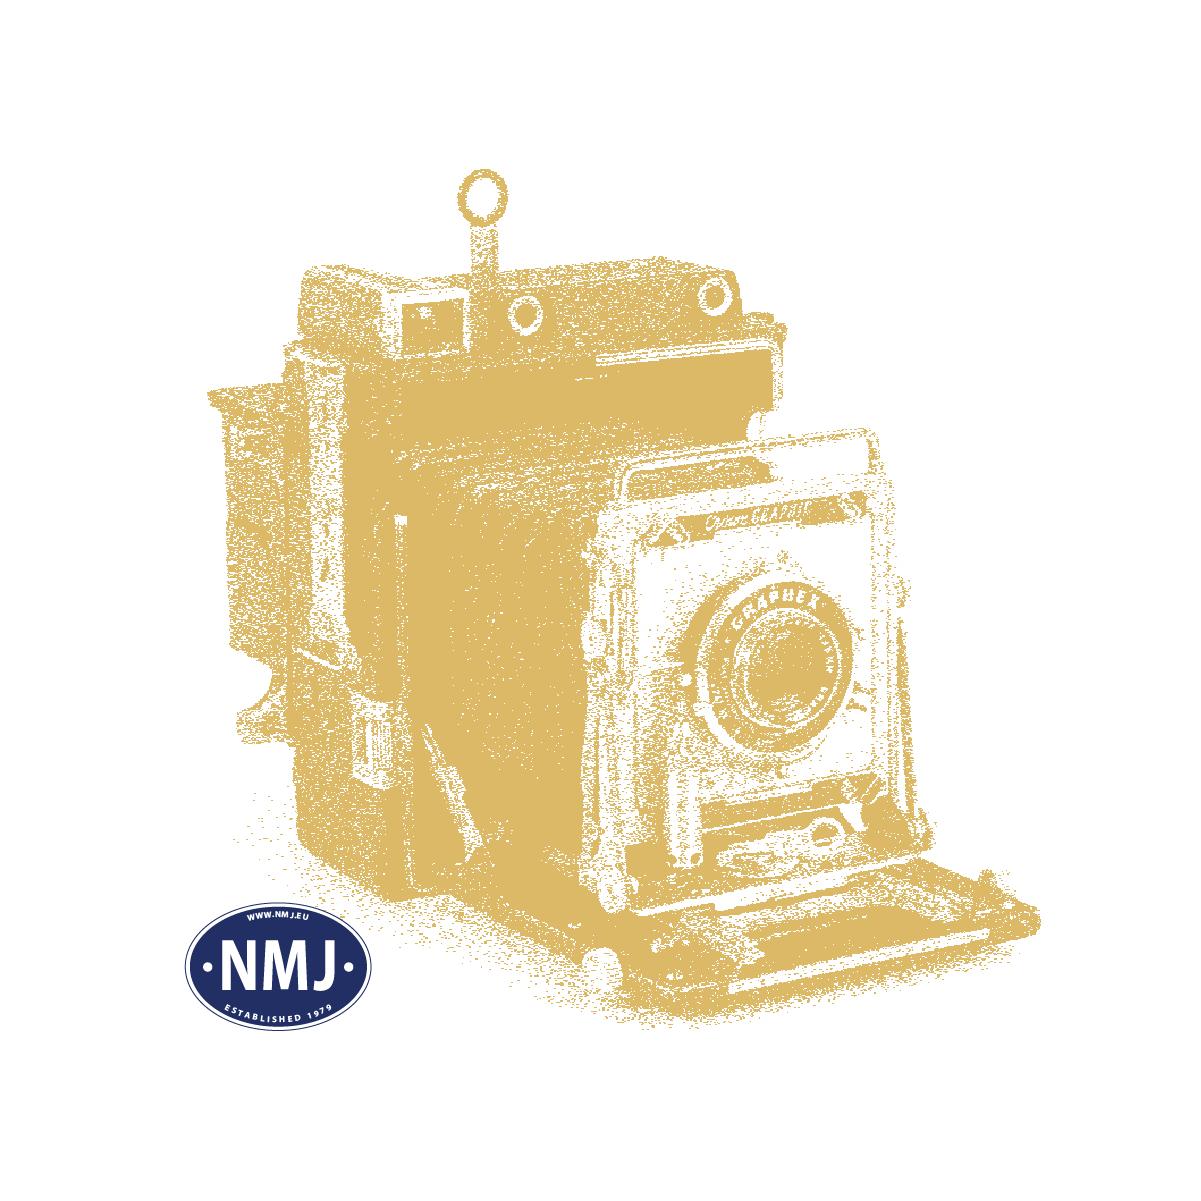 NMJT80.101 - NMJ Topline NSB EL17.2221 (V2.0), DC, rotbraun